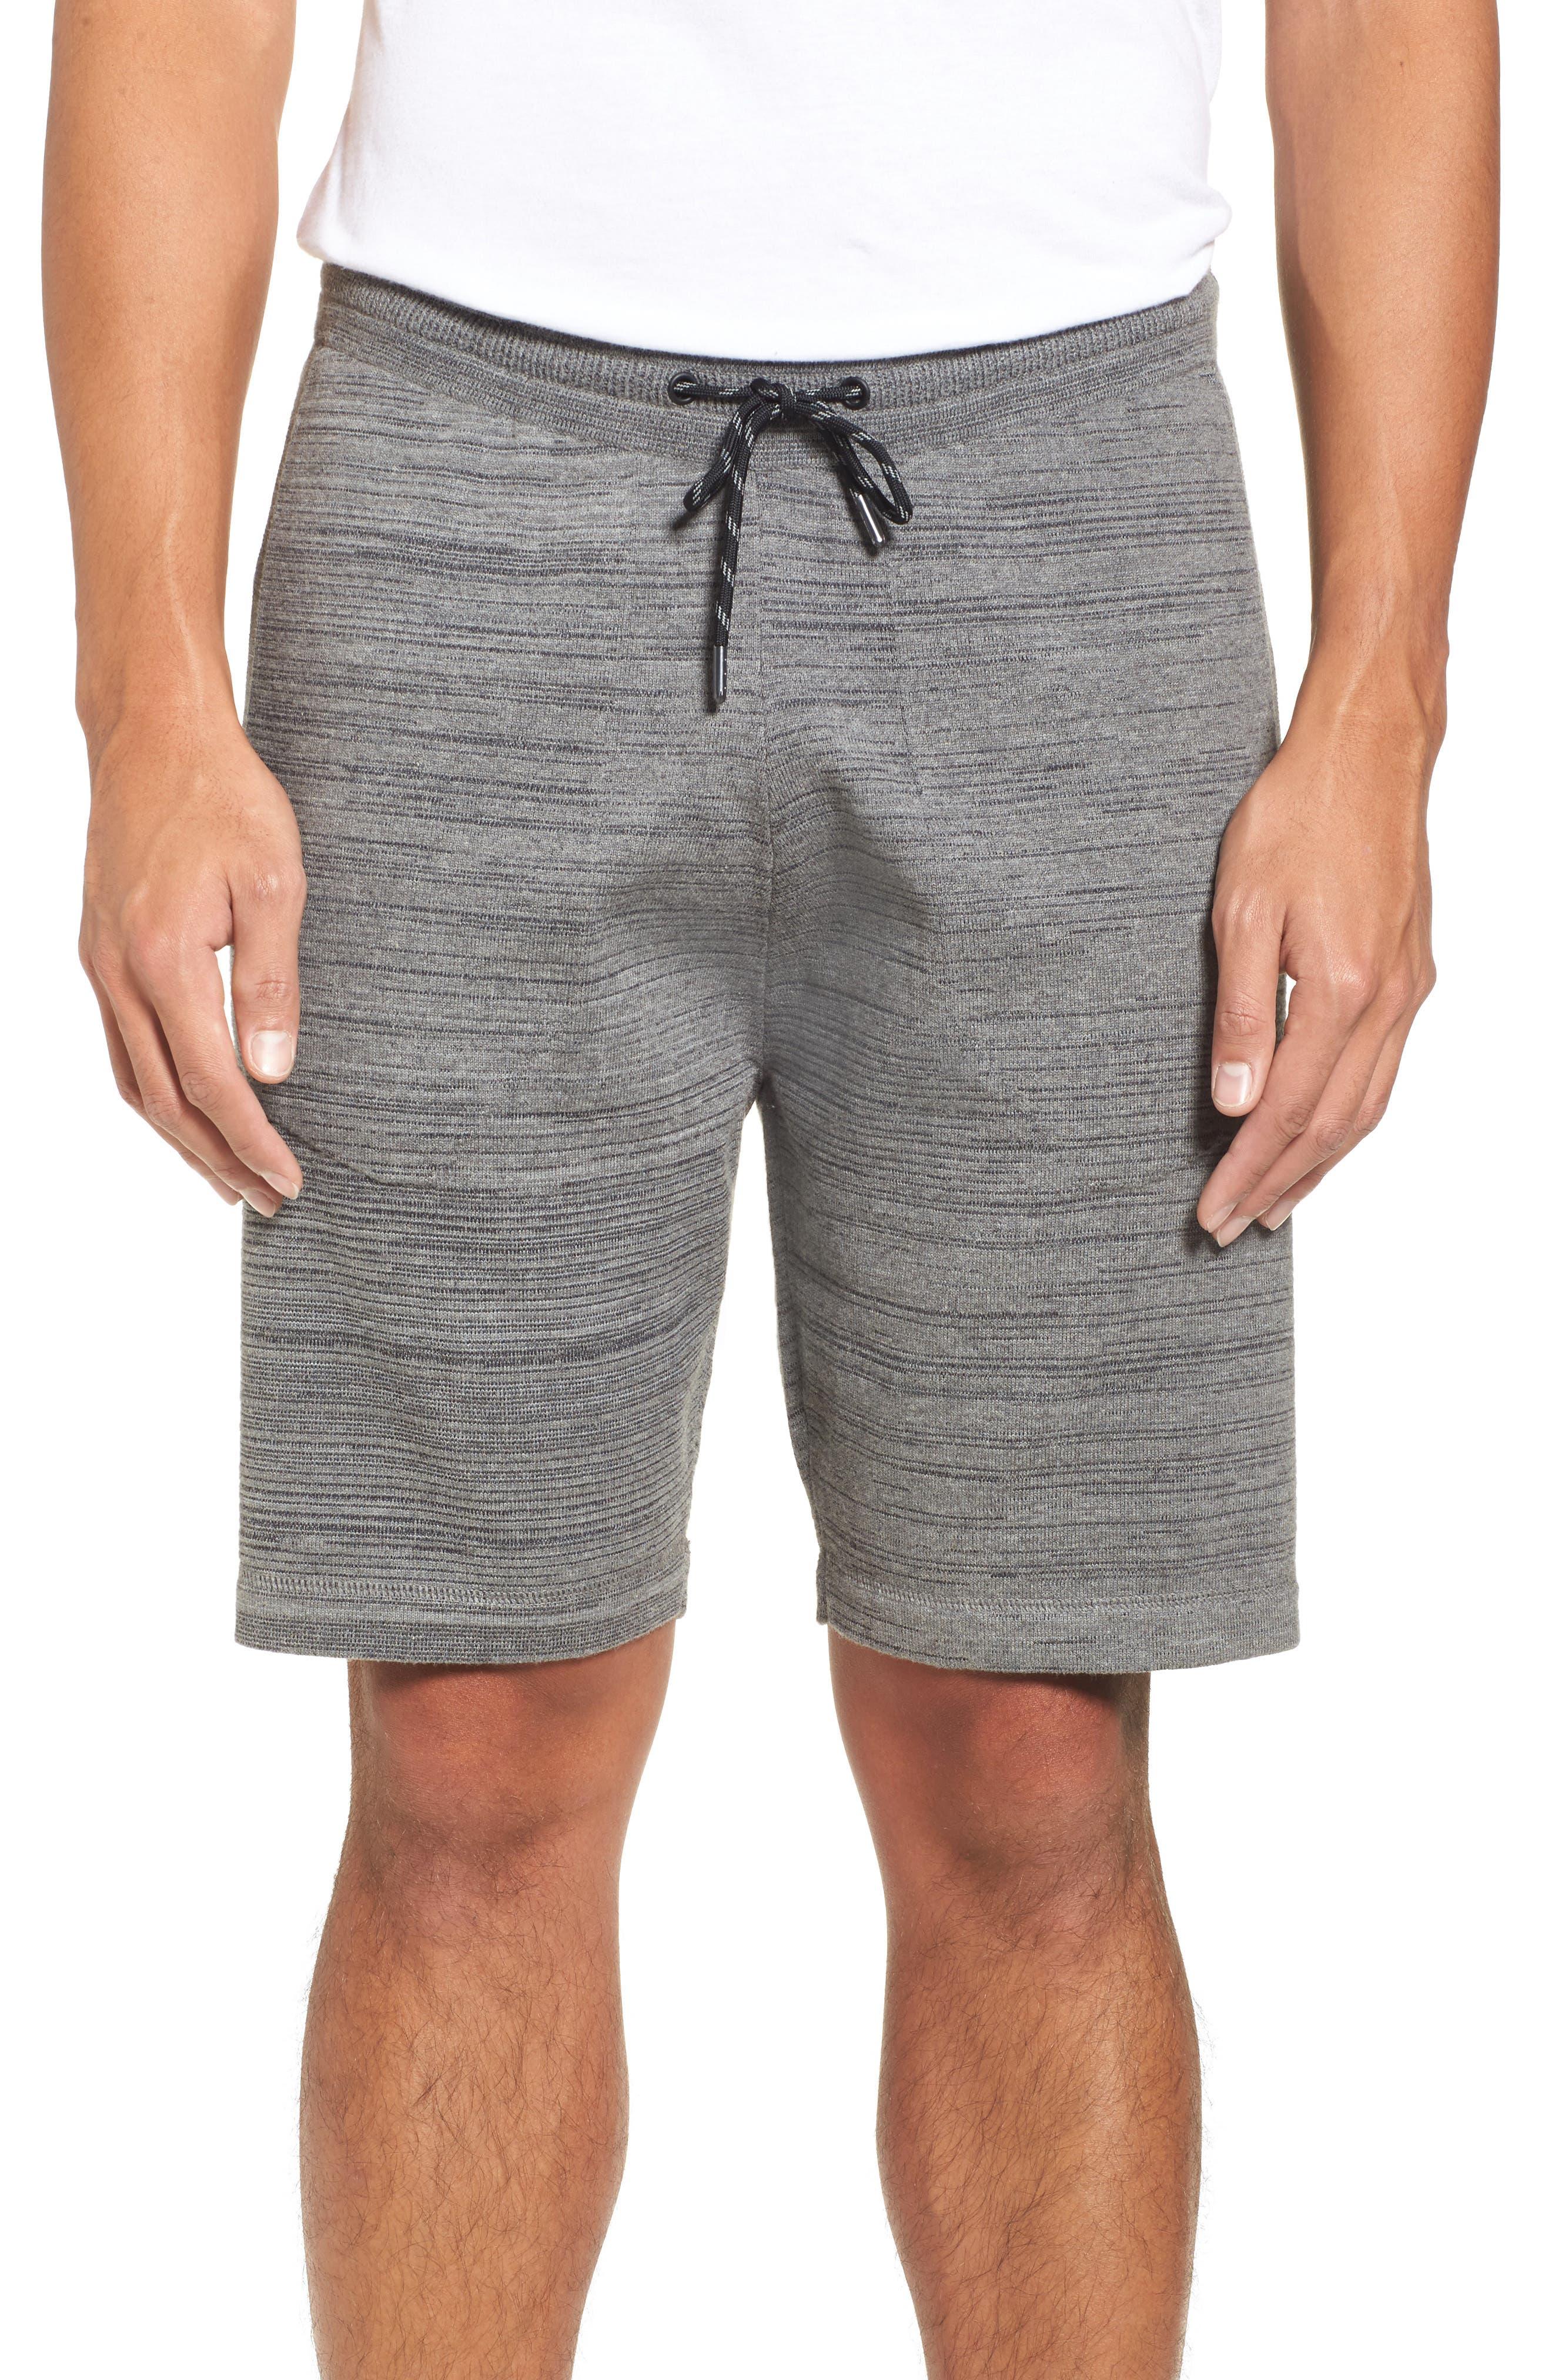 Tech Shorts,                         Main,                         color, 030